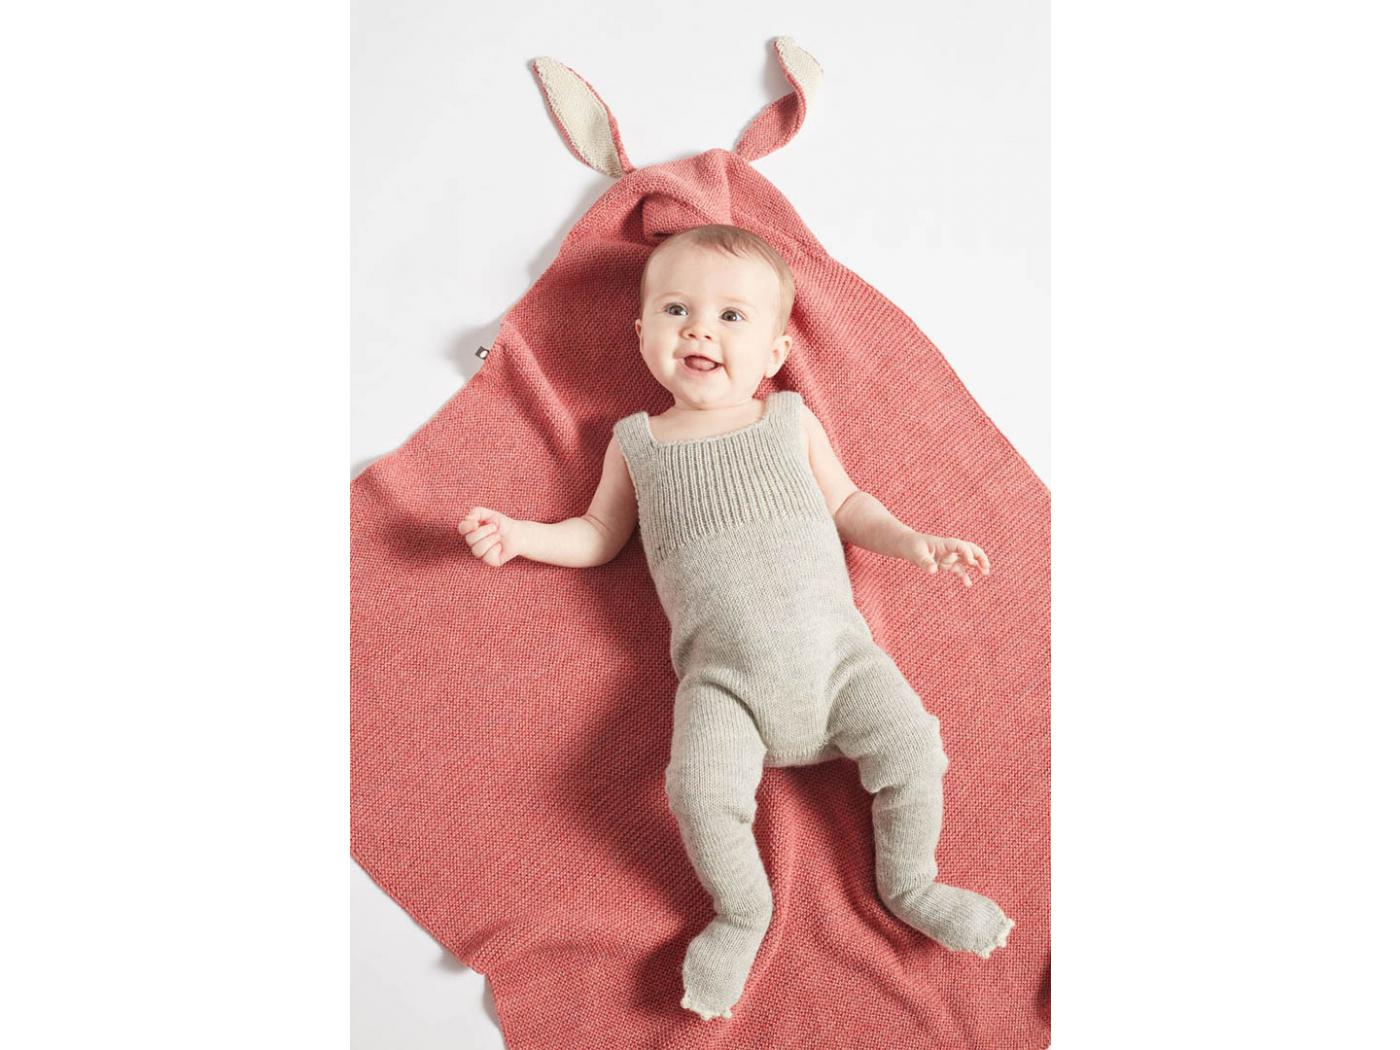 Oeuf Baby Clothes Couverture Cape Lapin Rose En Alpaga